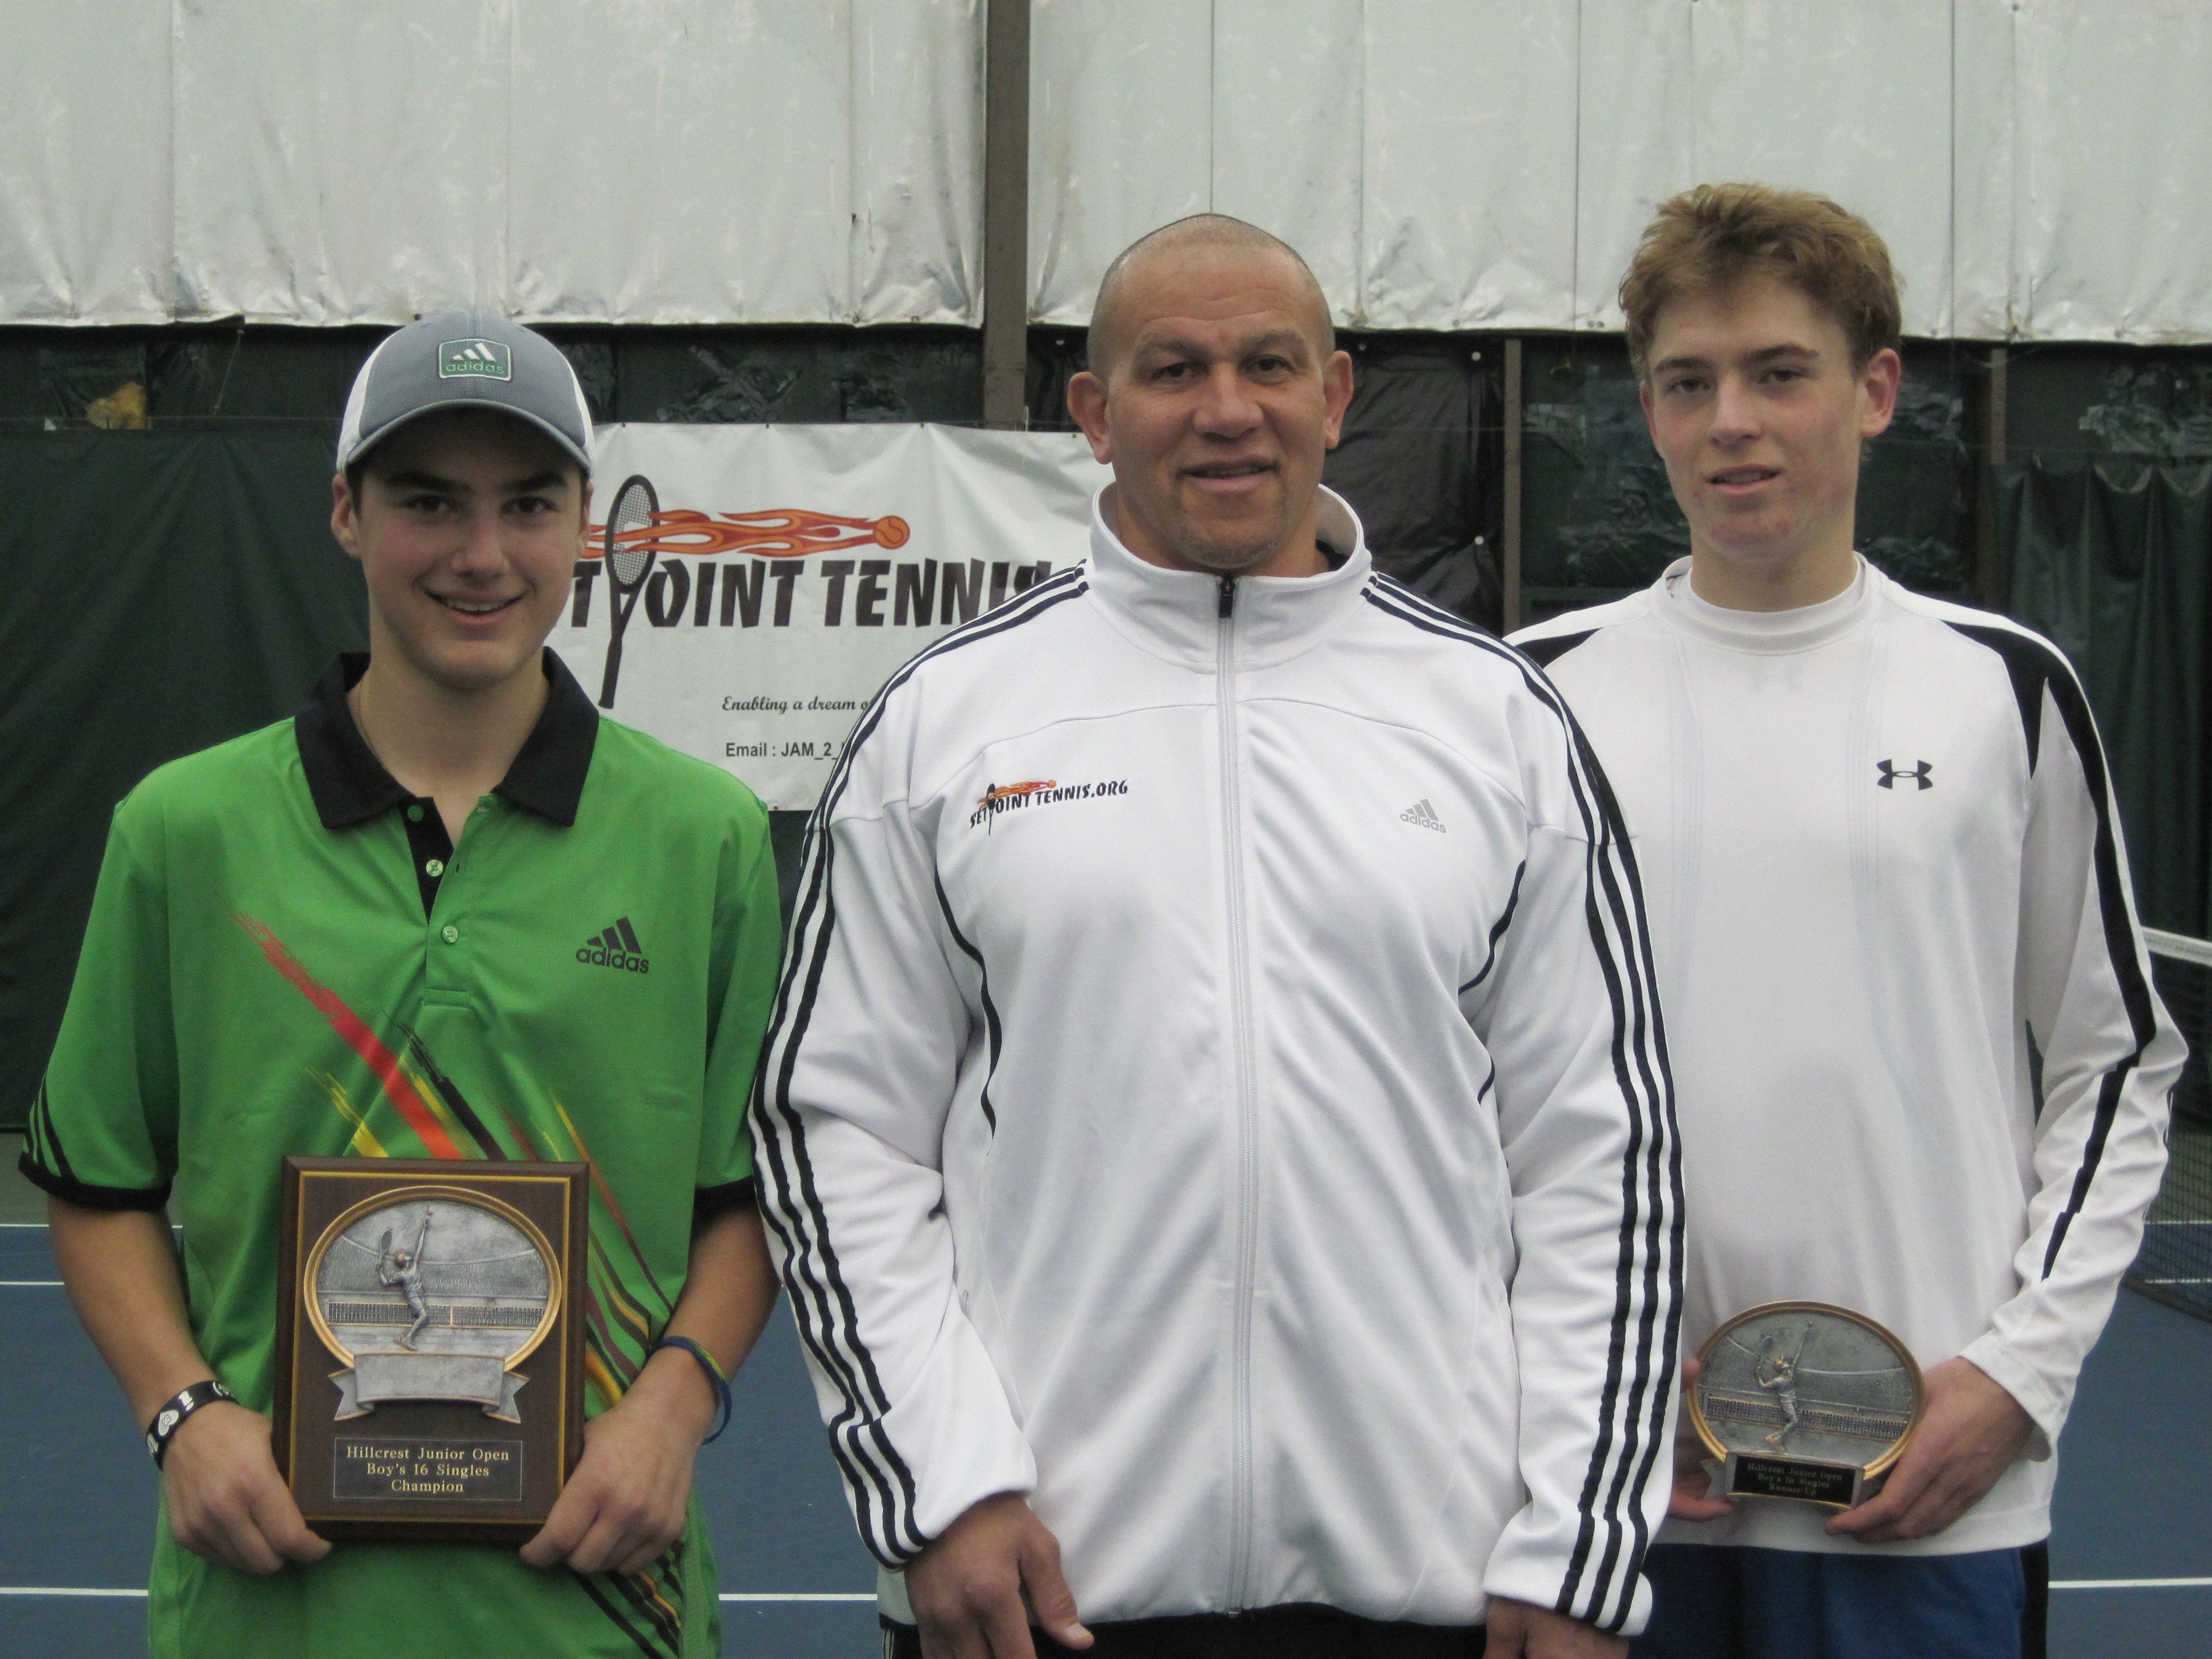 Hillcrest Level 4 Boys 16 Tennis Tournament Singles Champion and Runnerup